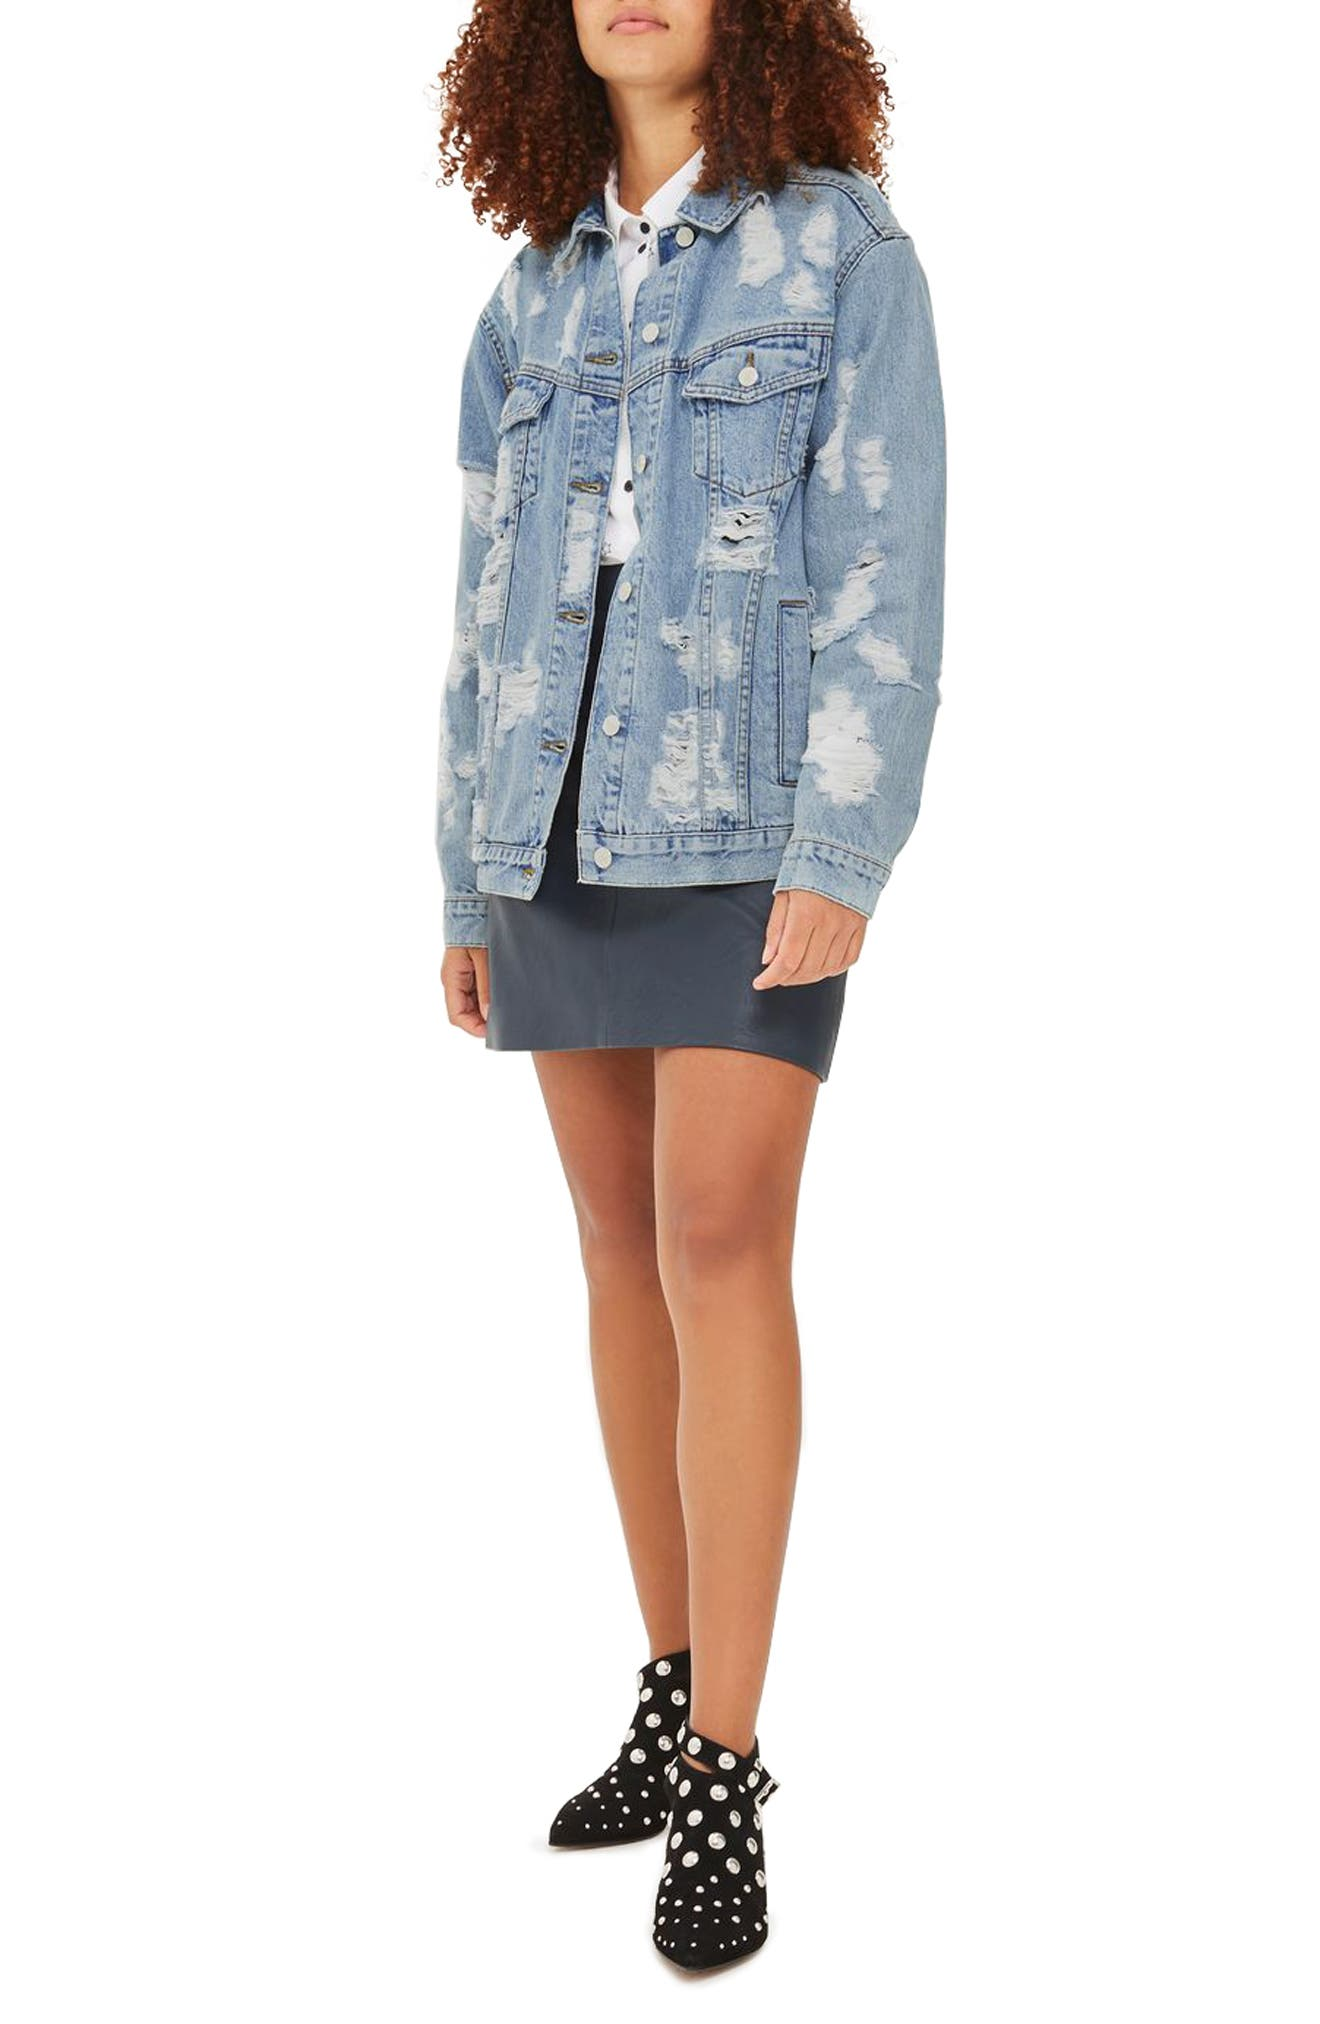 Alternate Image 1 Selected - Topshop Ripped Denim Jacket